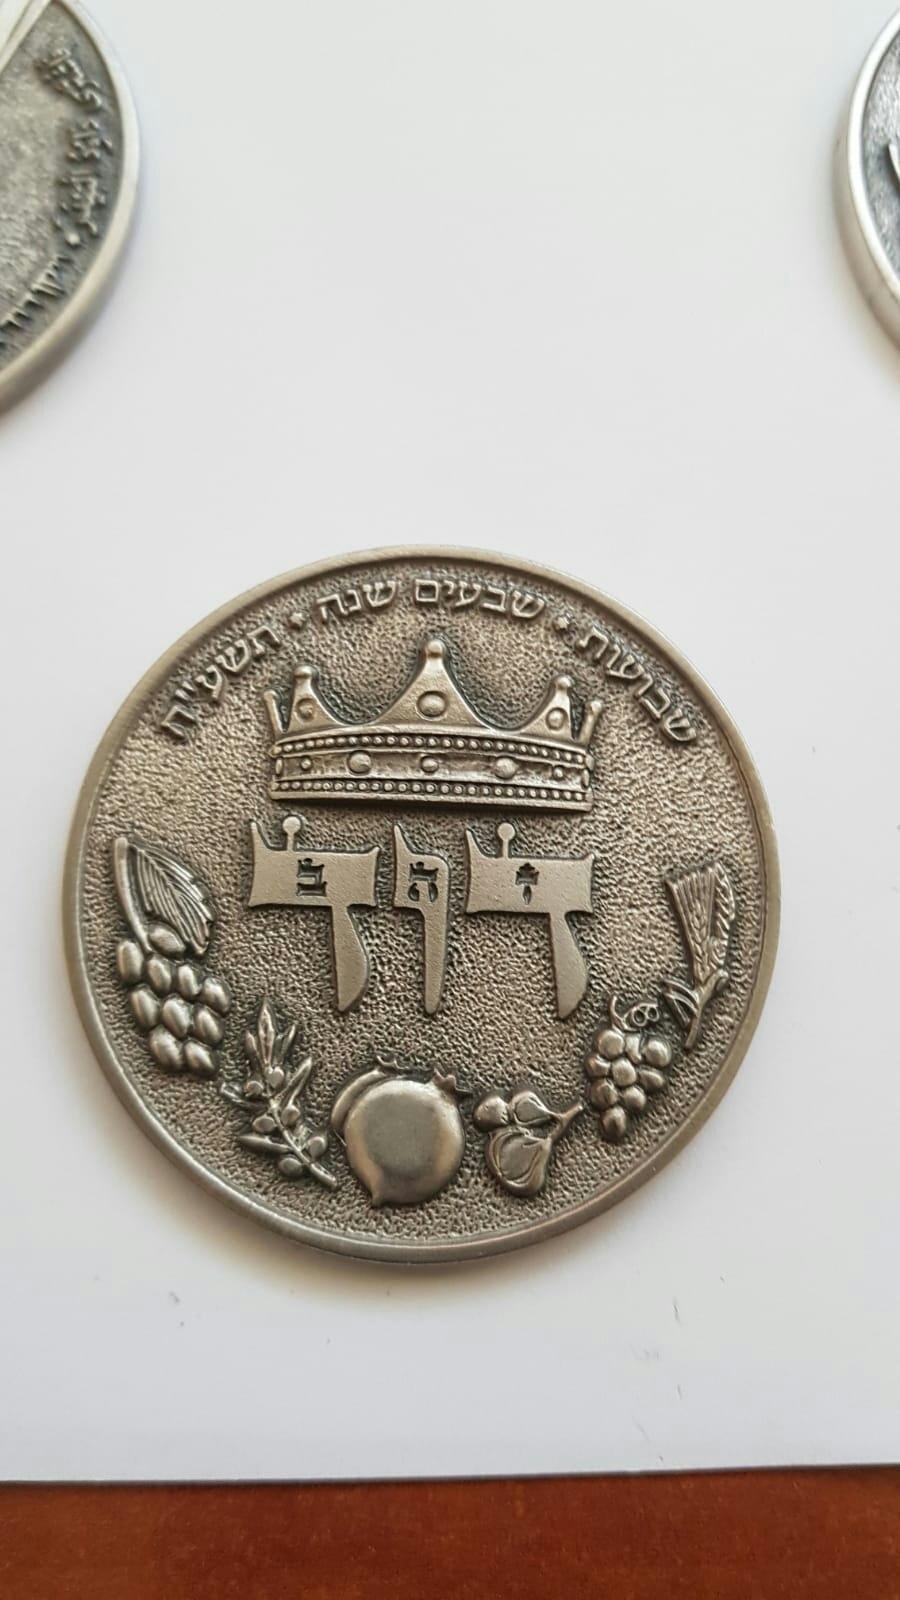 HALF SHEKEL KING DAVID COIN - silver plated 00008